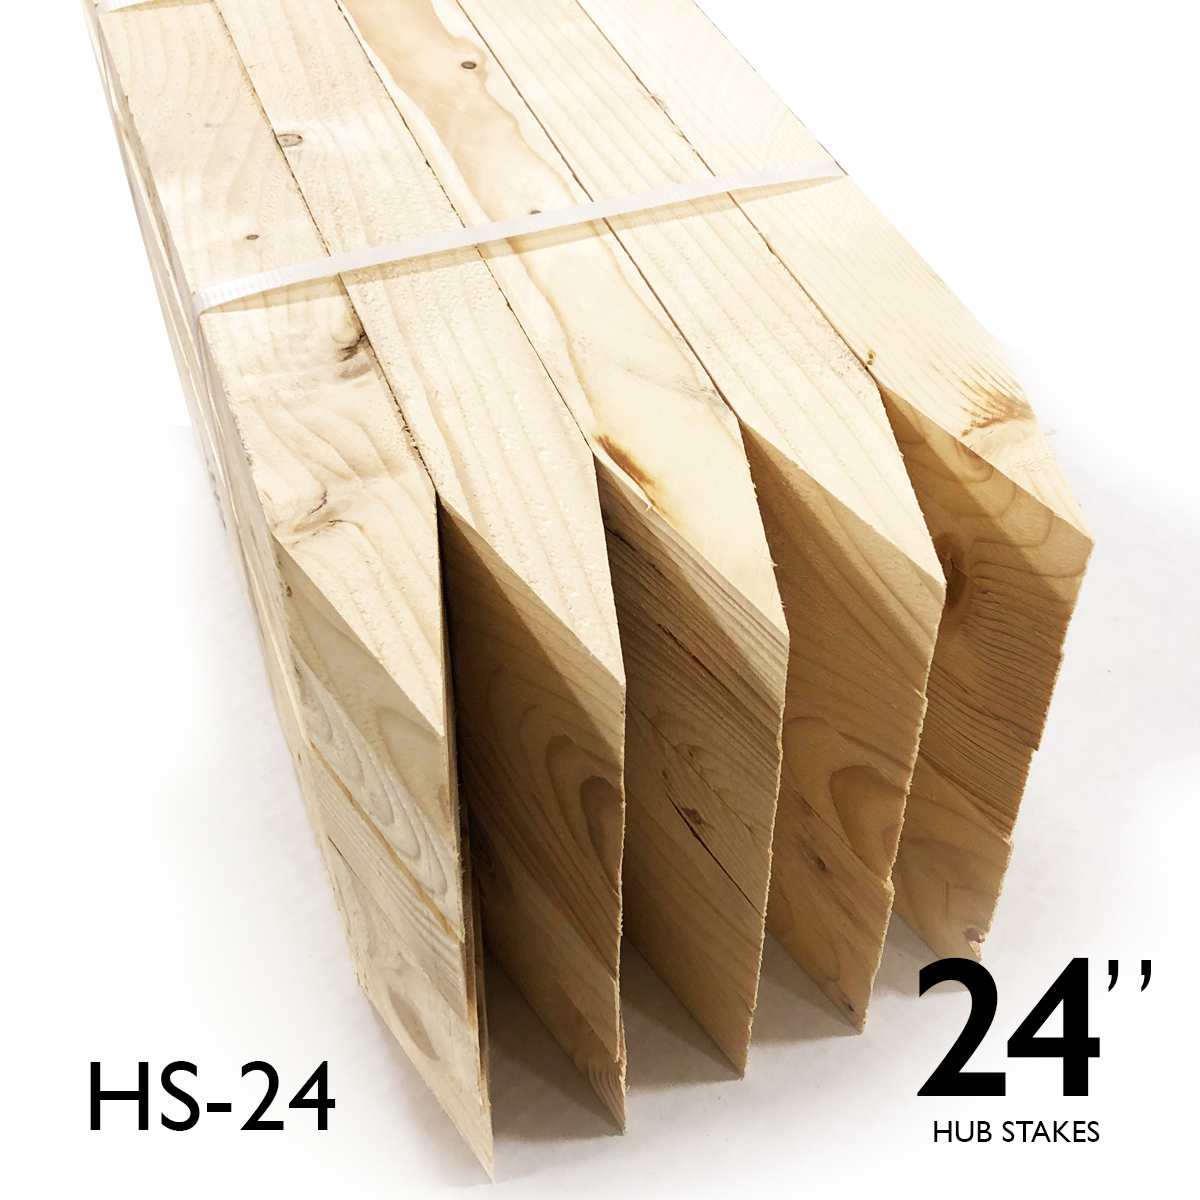 "Hub Stakes 2 X 2 X 24"" FULL Pallet"